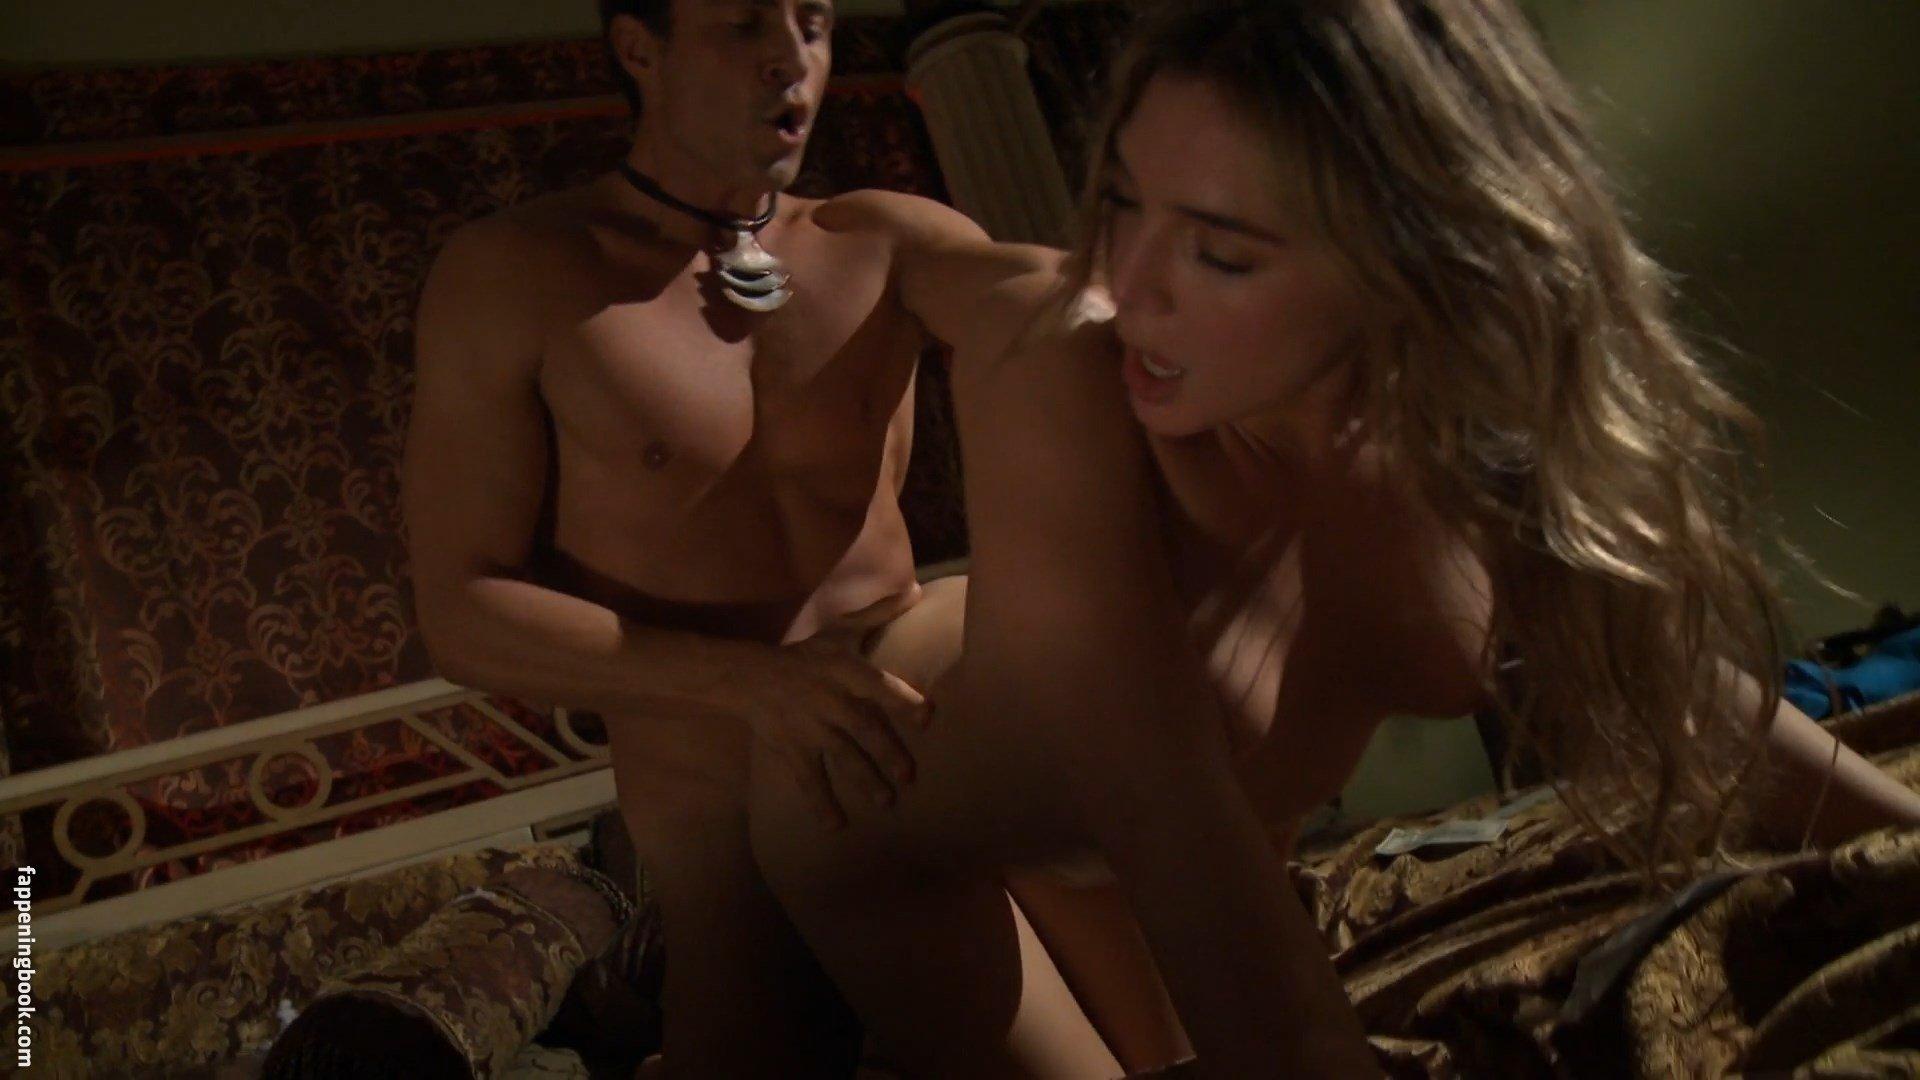 Playboy jeannine michaelsen #TheFappening